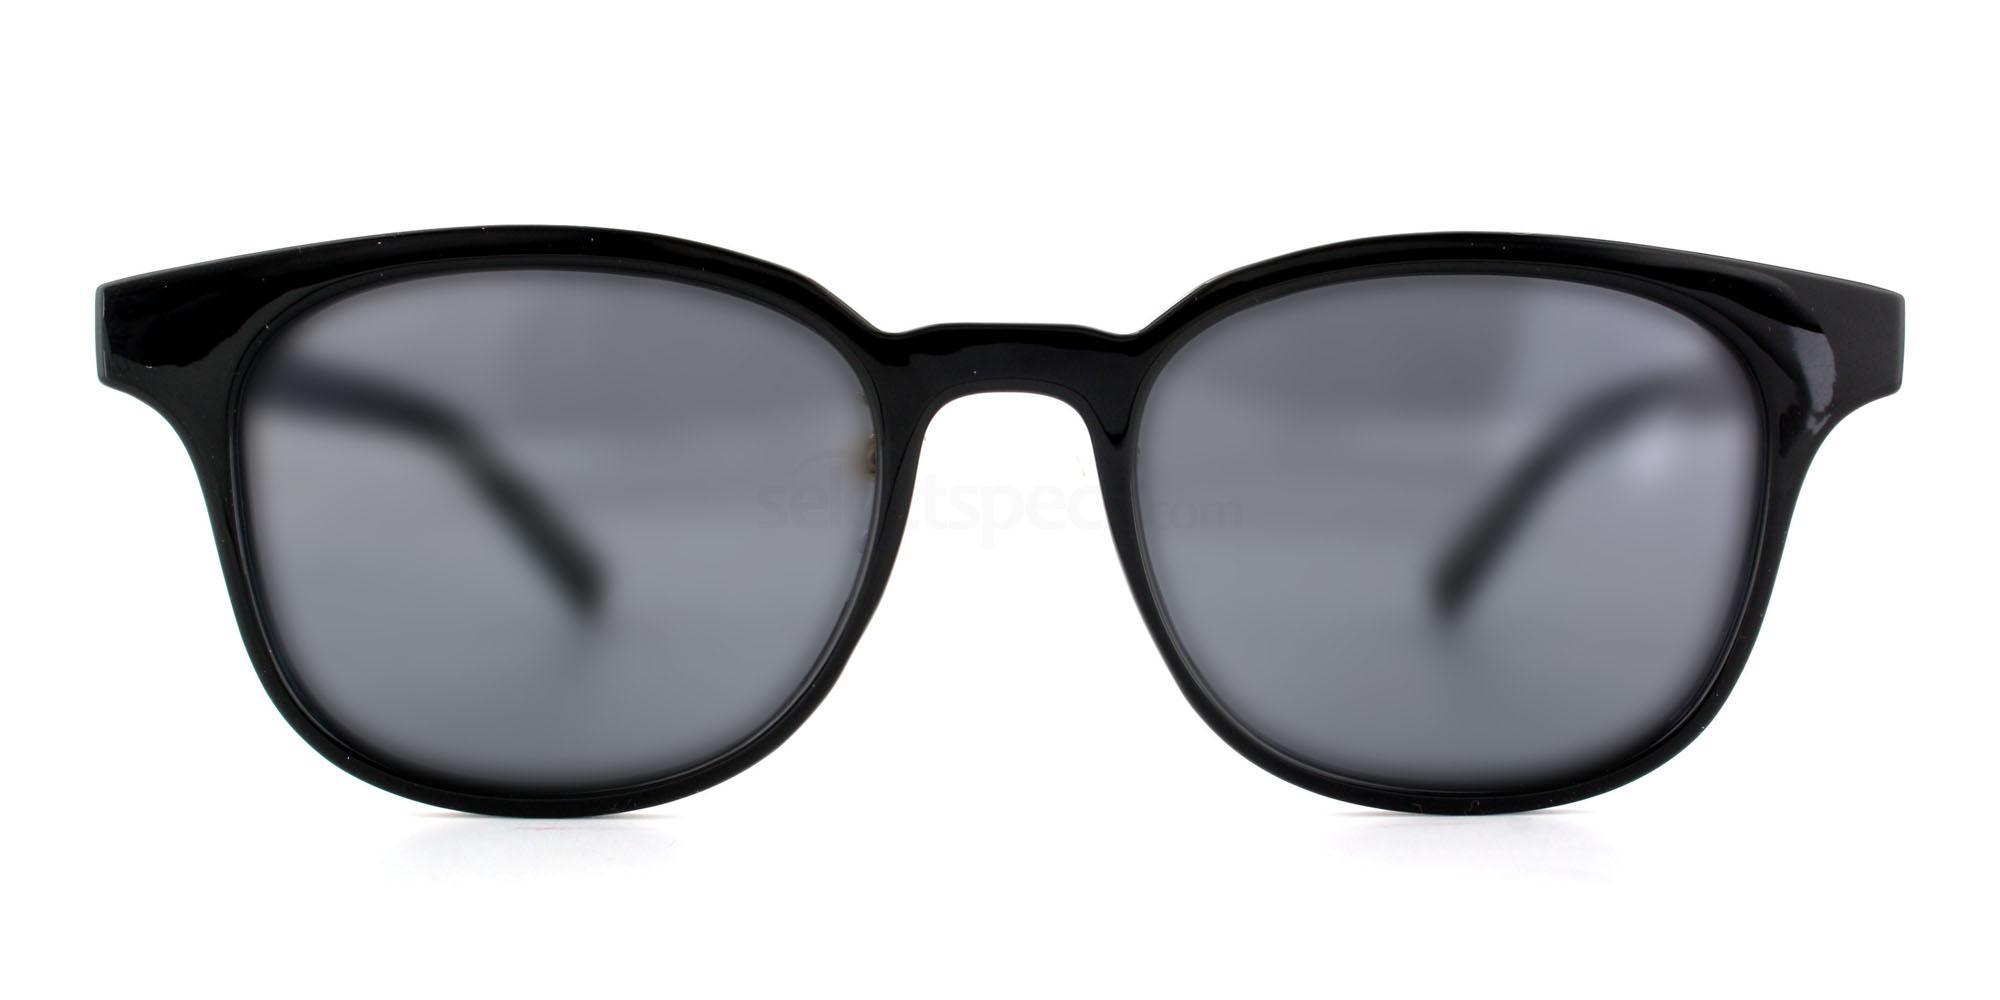 C1 S2801 Sunglasses, SelectSpecs